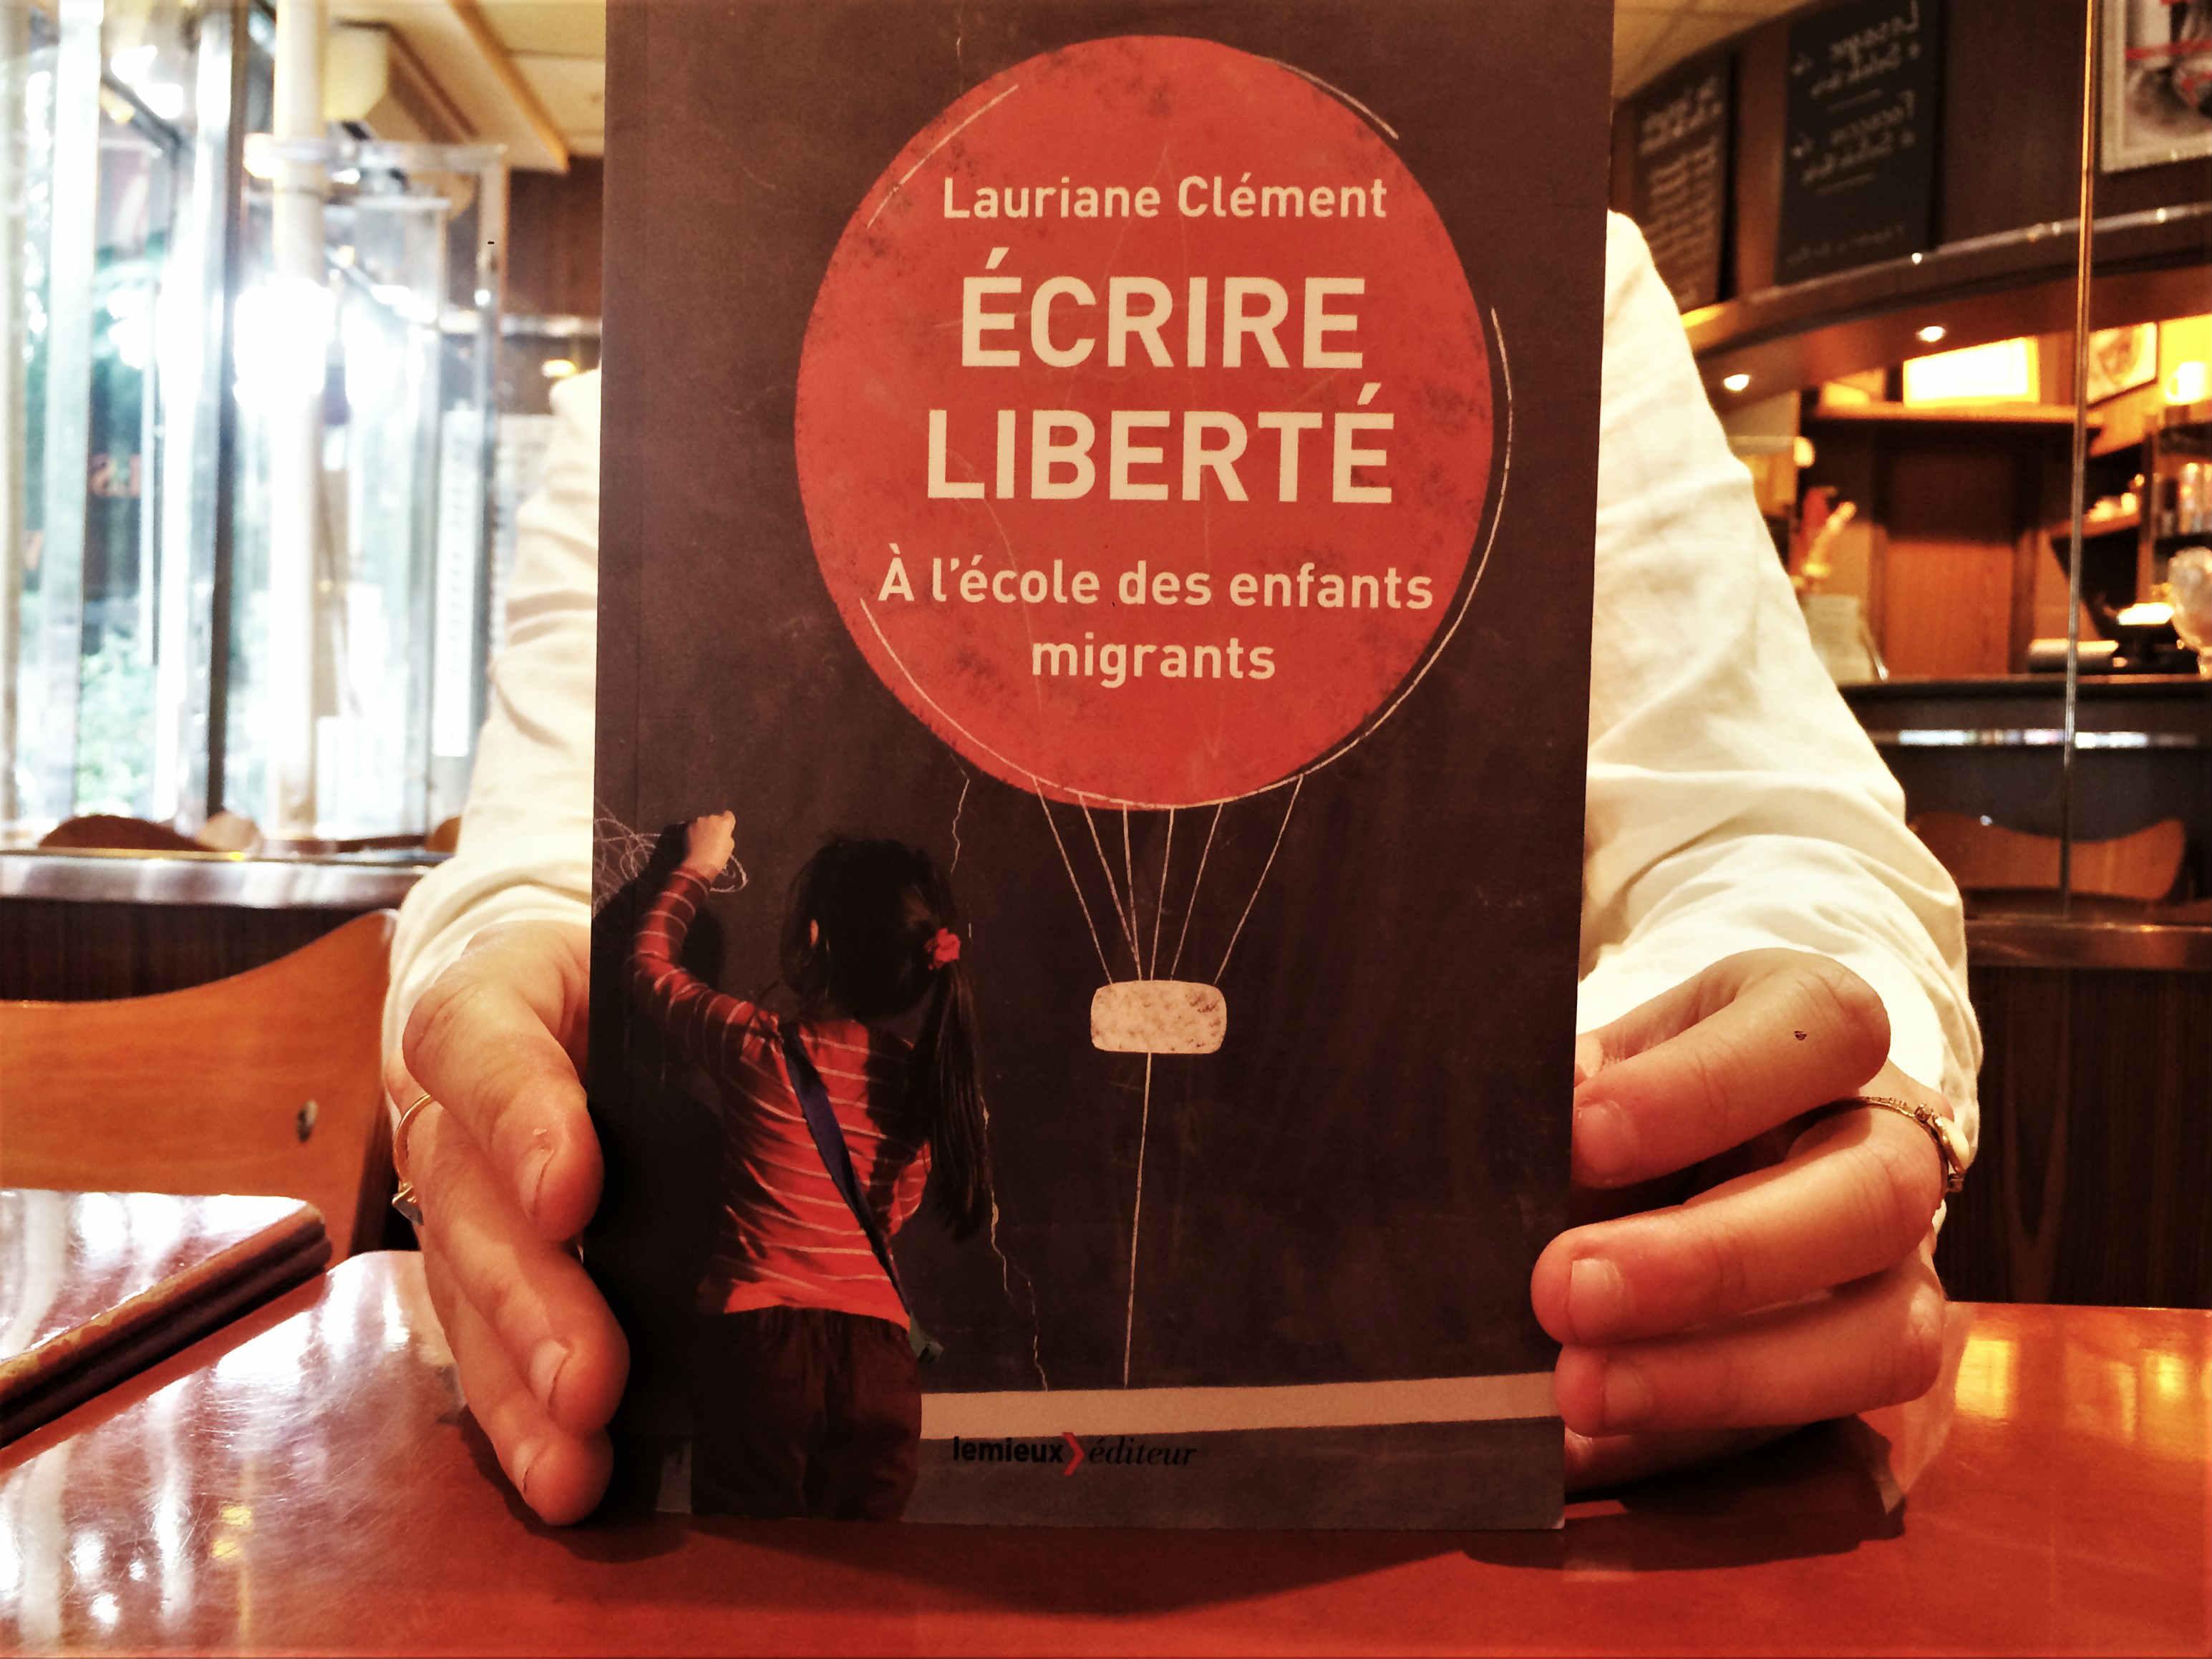 https://backend.streetpress.com/sites/default/files/ecrire_liberte_cover.jpg